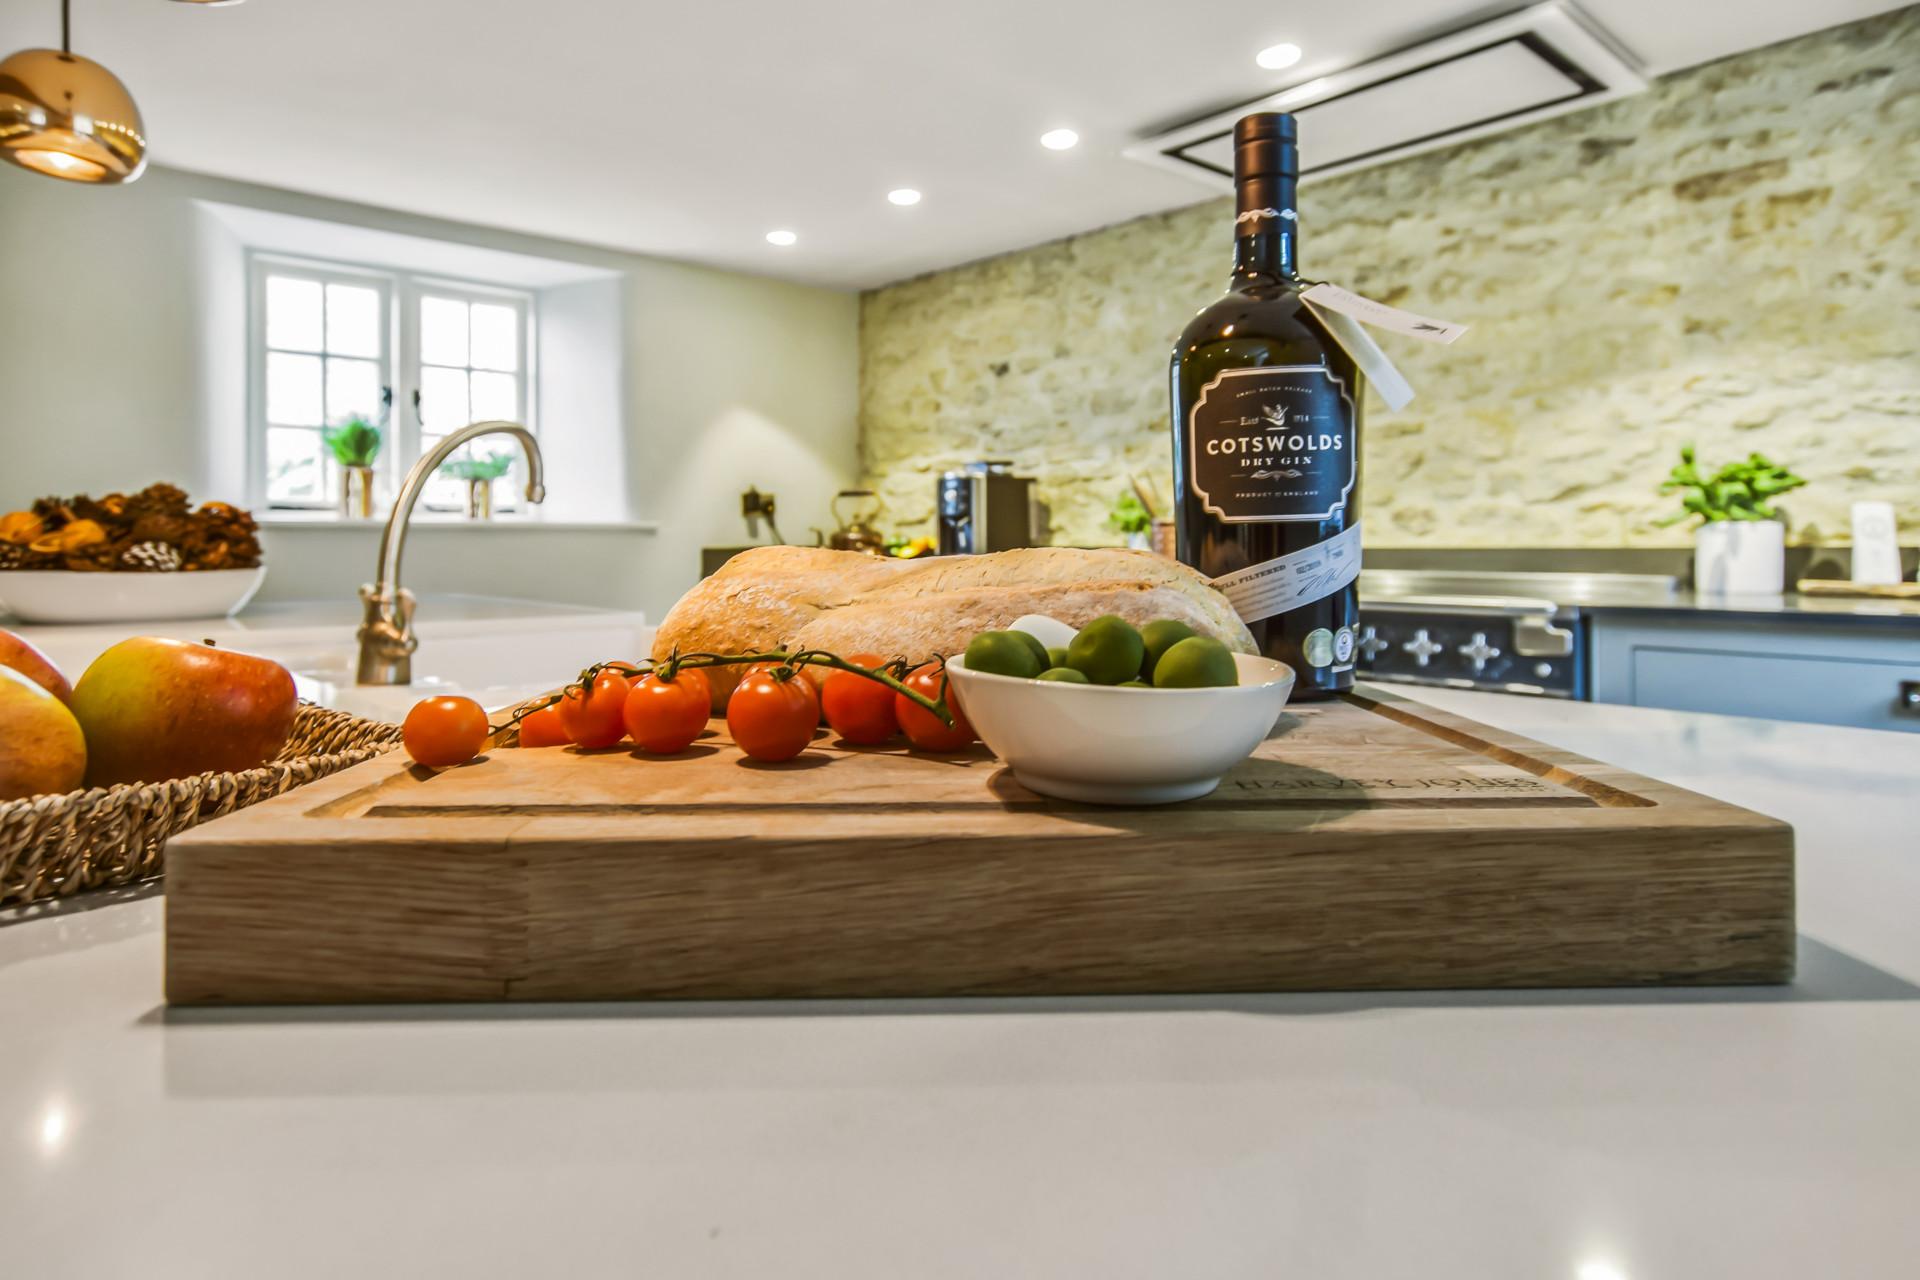 Cotswold Gin, Westerleigh Cottage Kitchen, Westerleigh